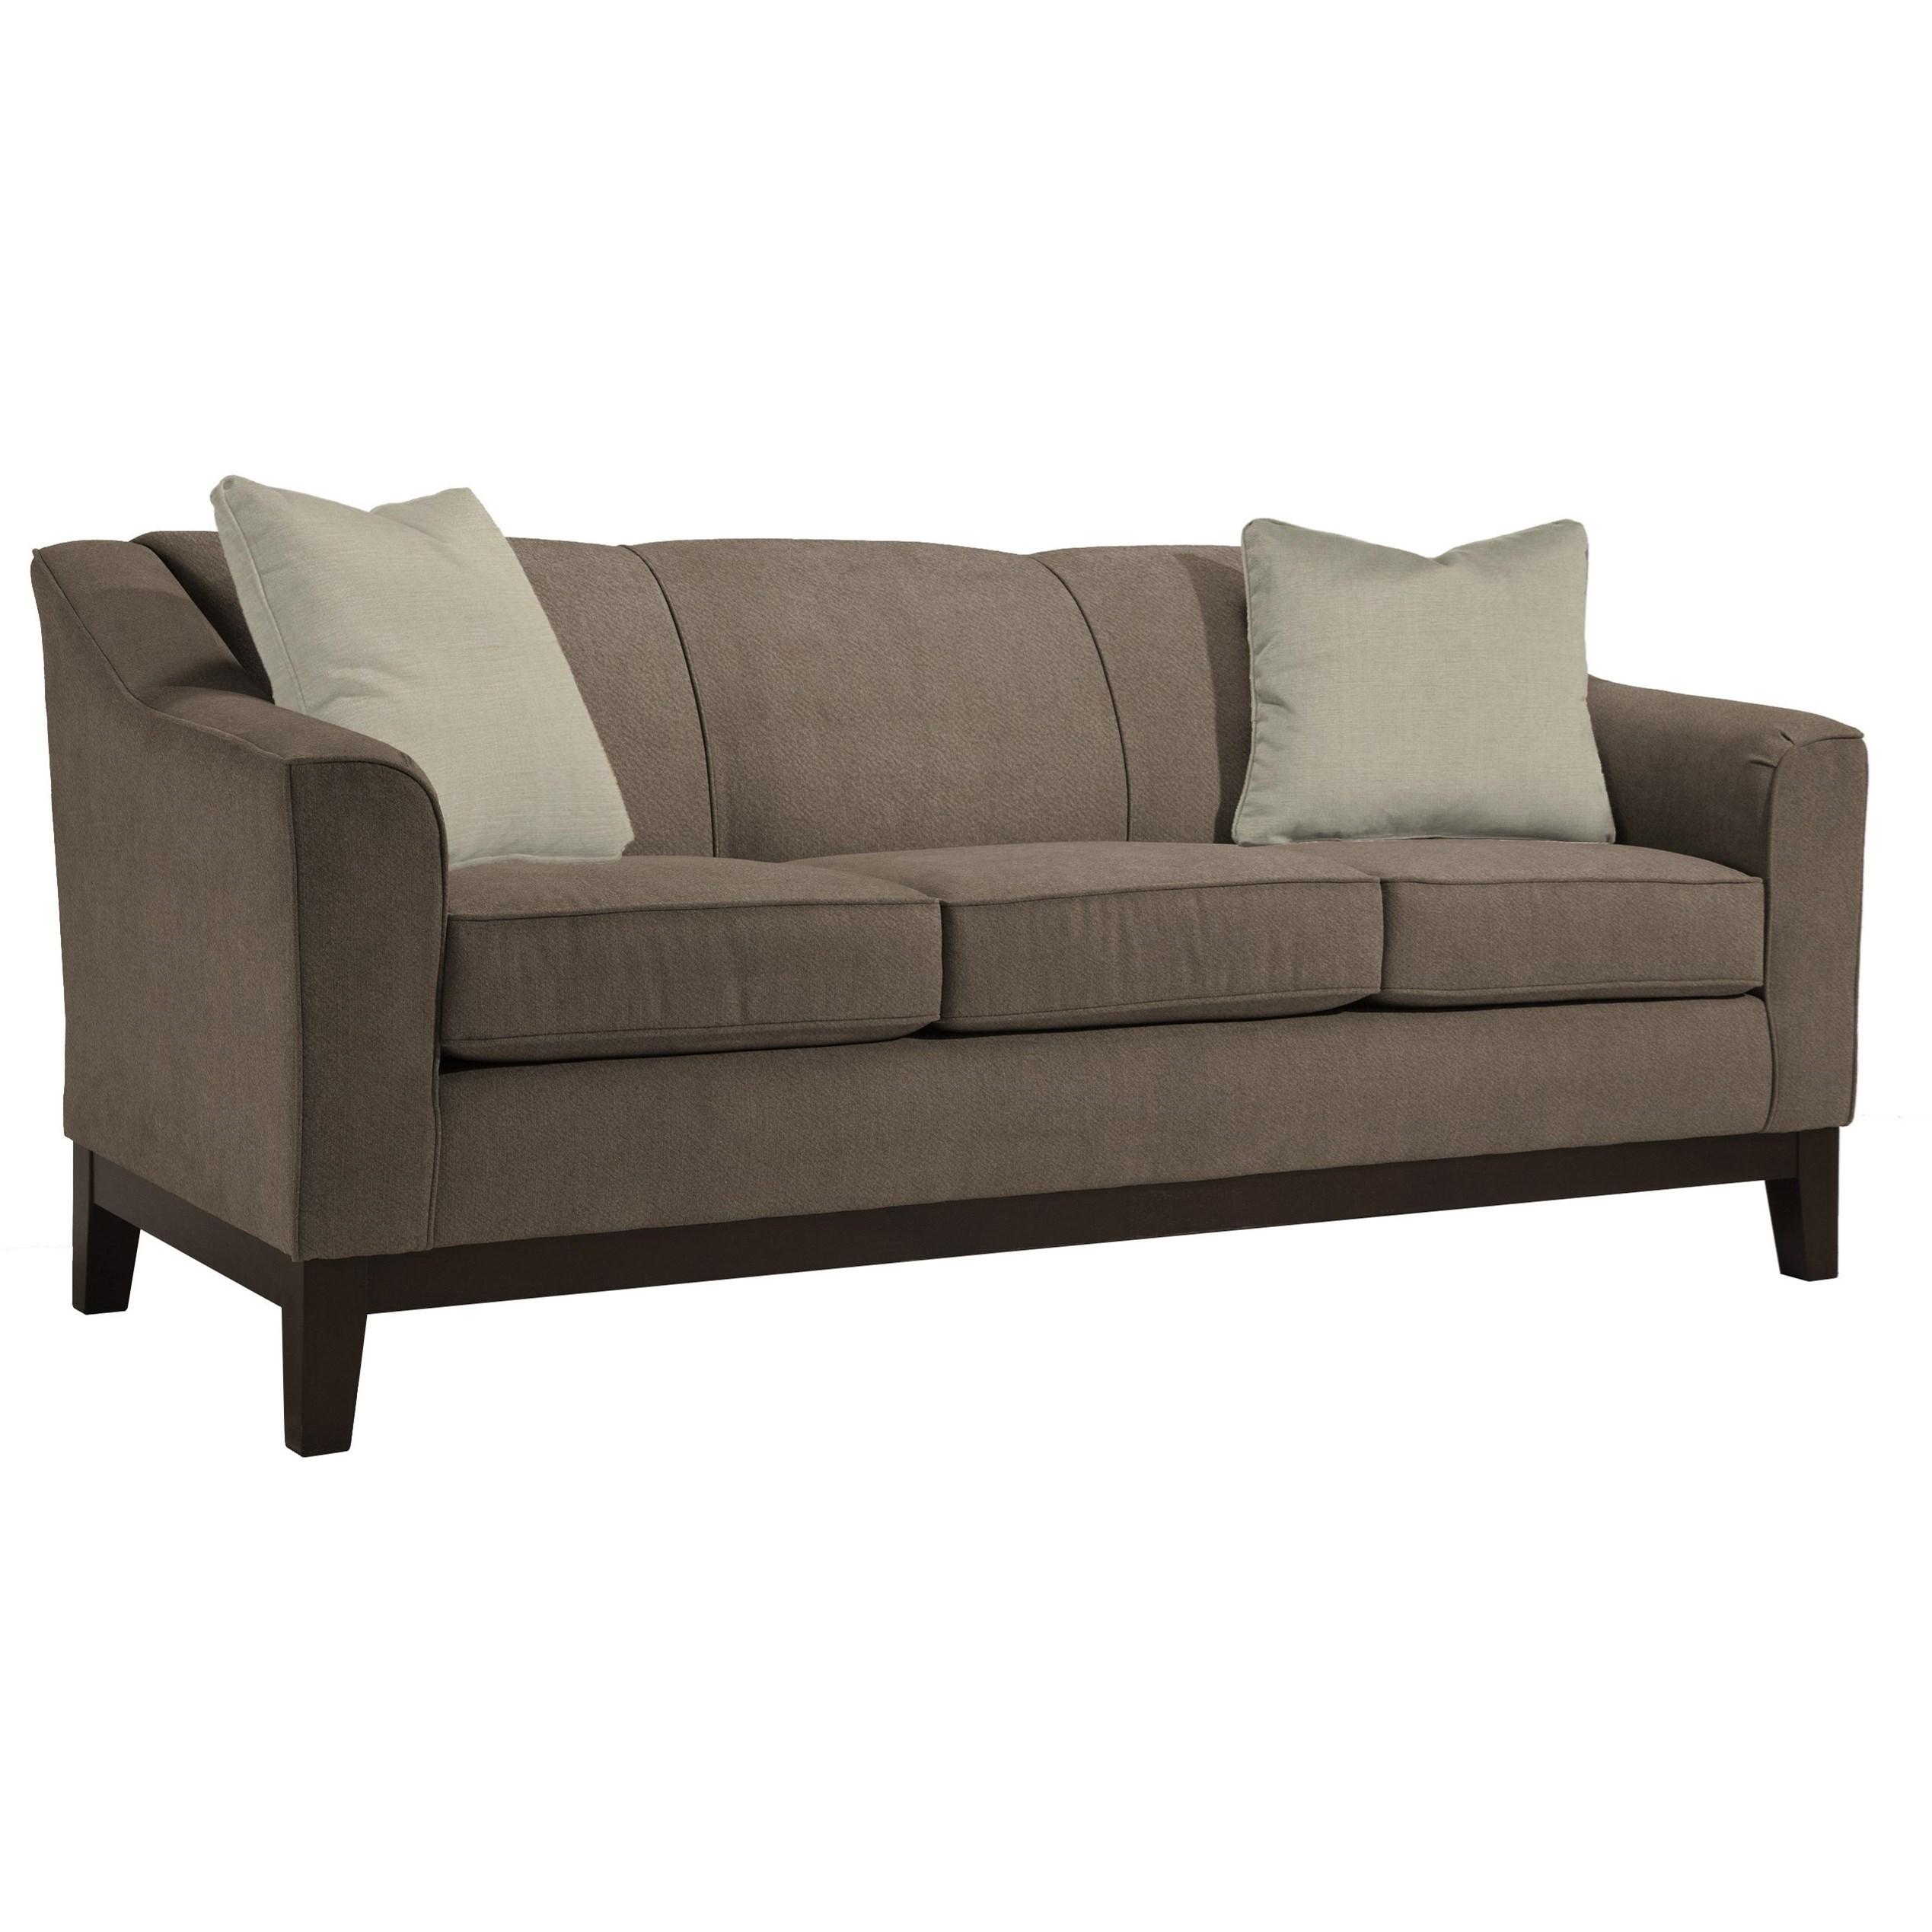 Best Home Furnishings Emeline Customizable Sofa - Item Number: 206338137-25199